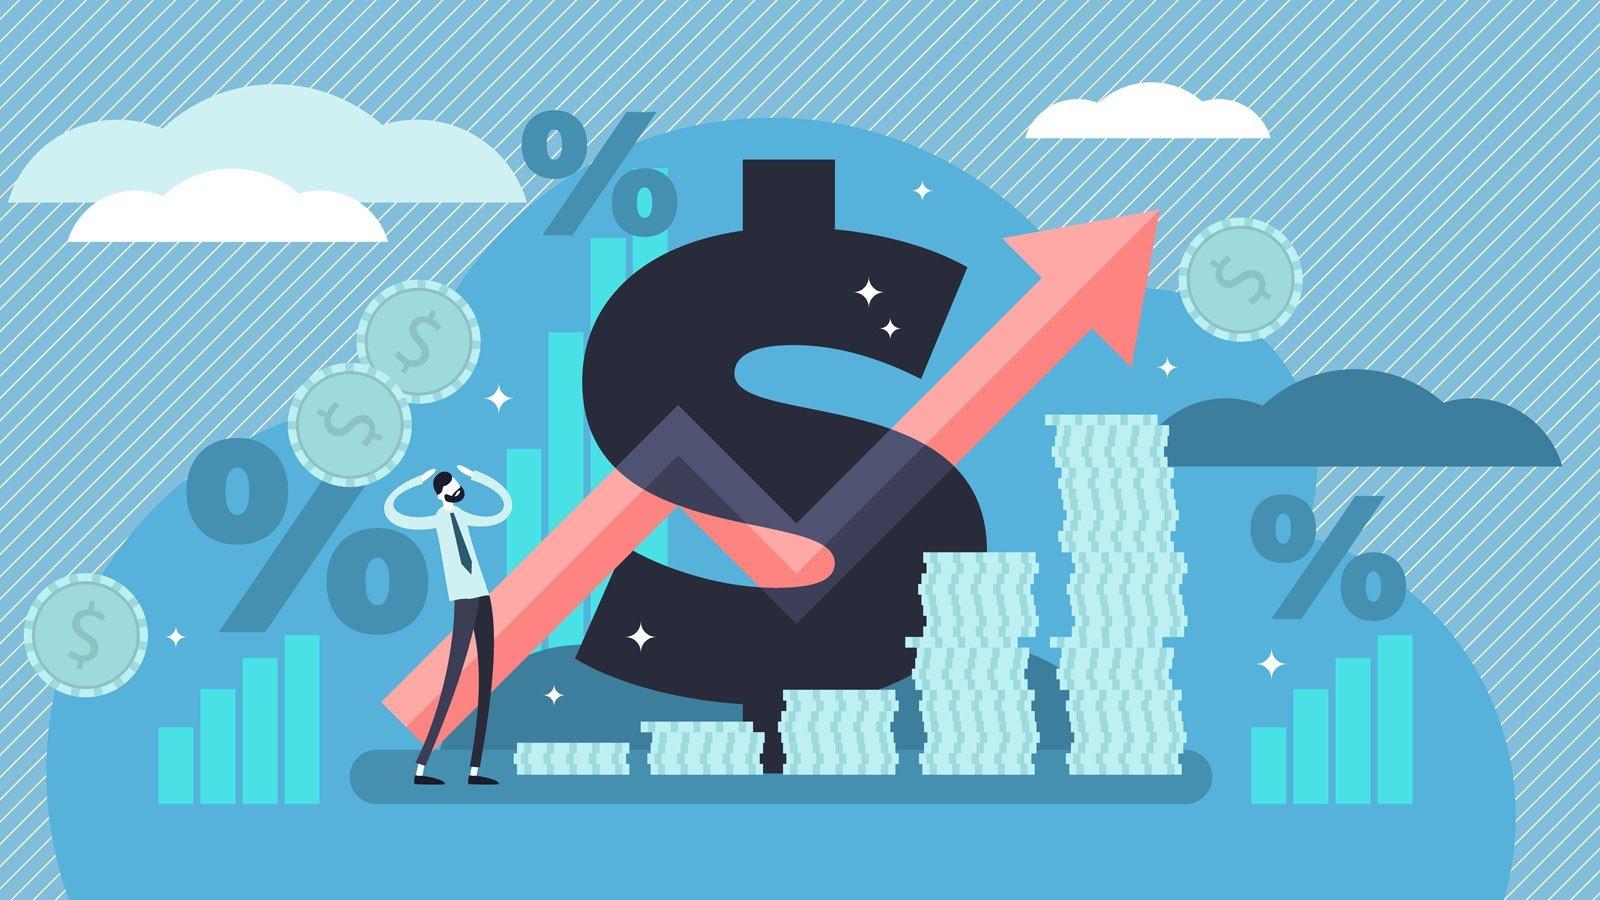 como mejorar la liquidez de una empresa